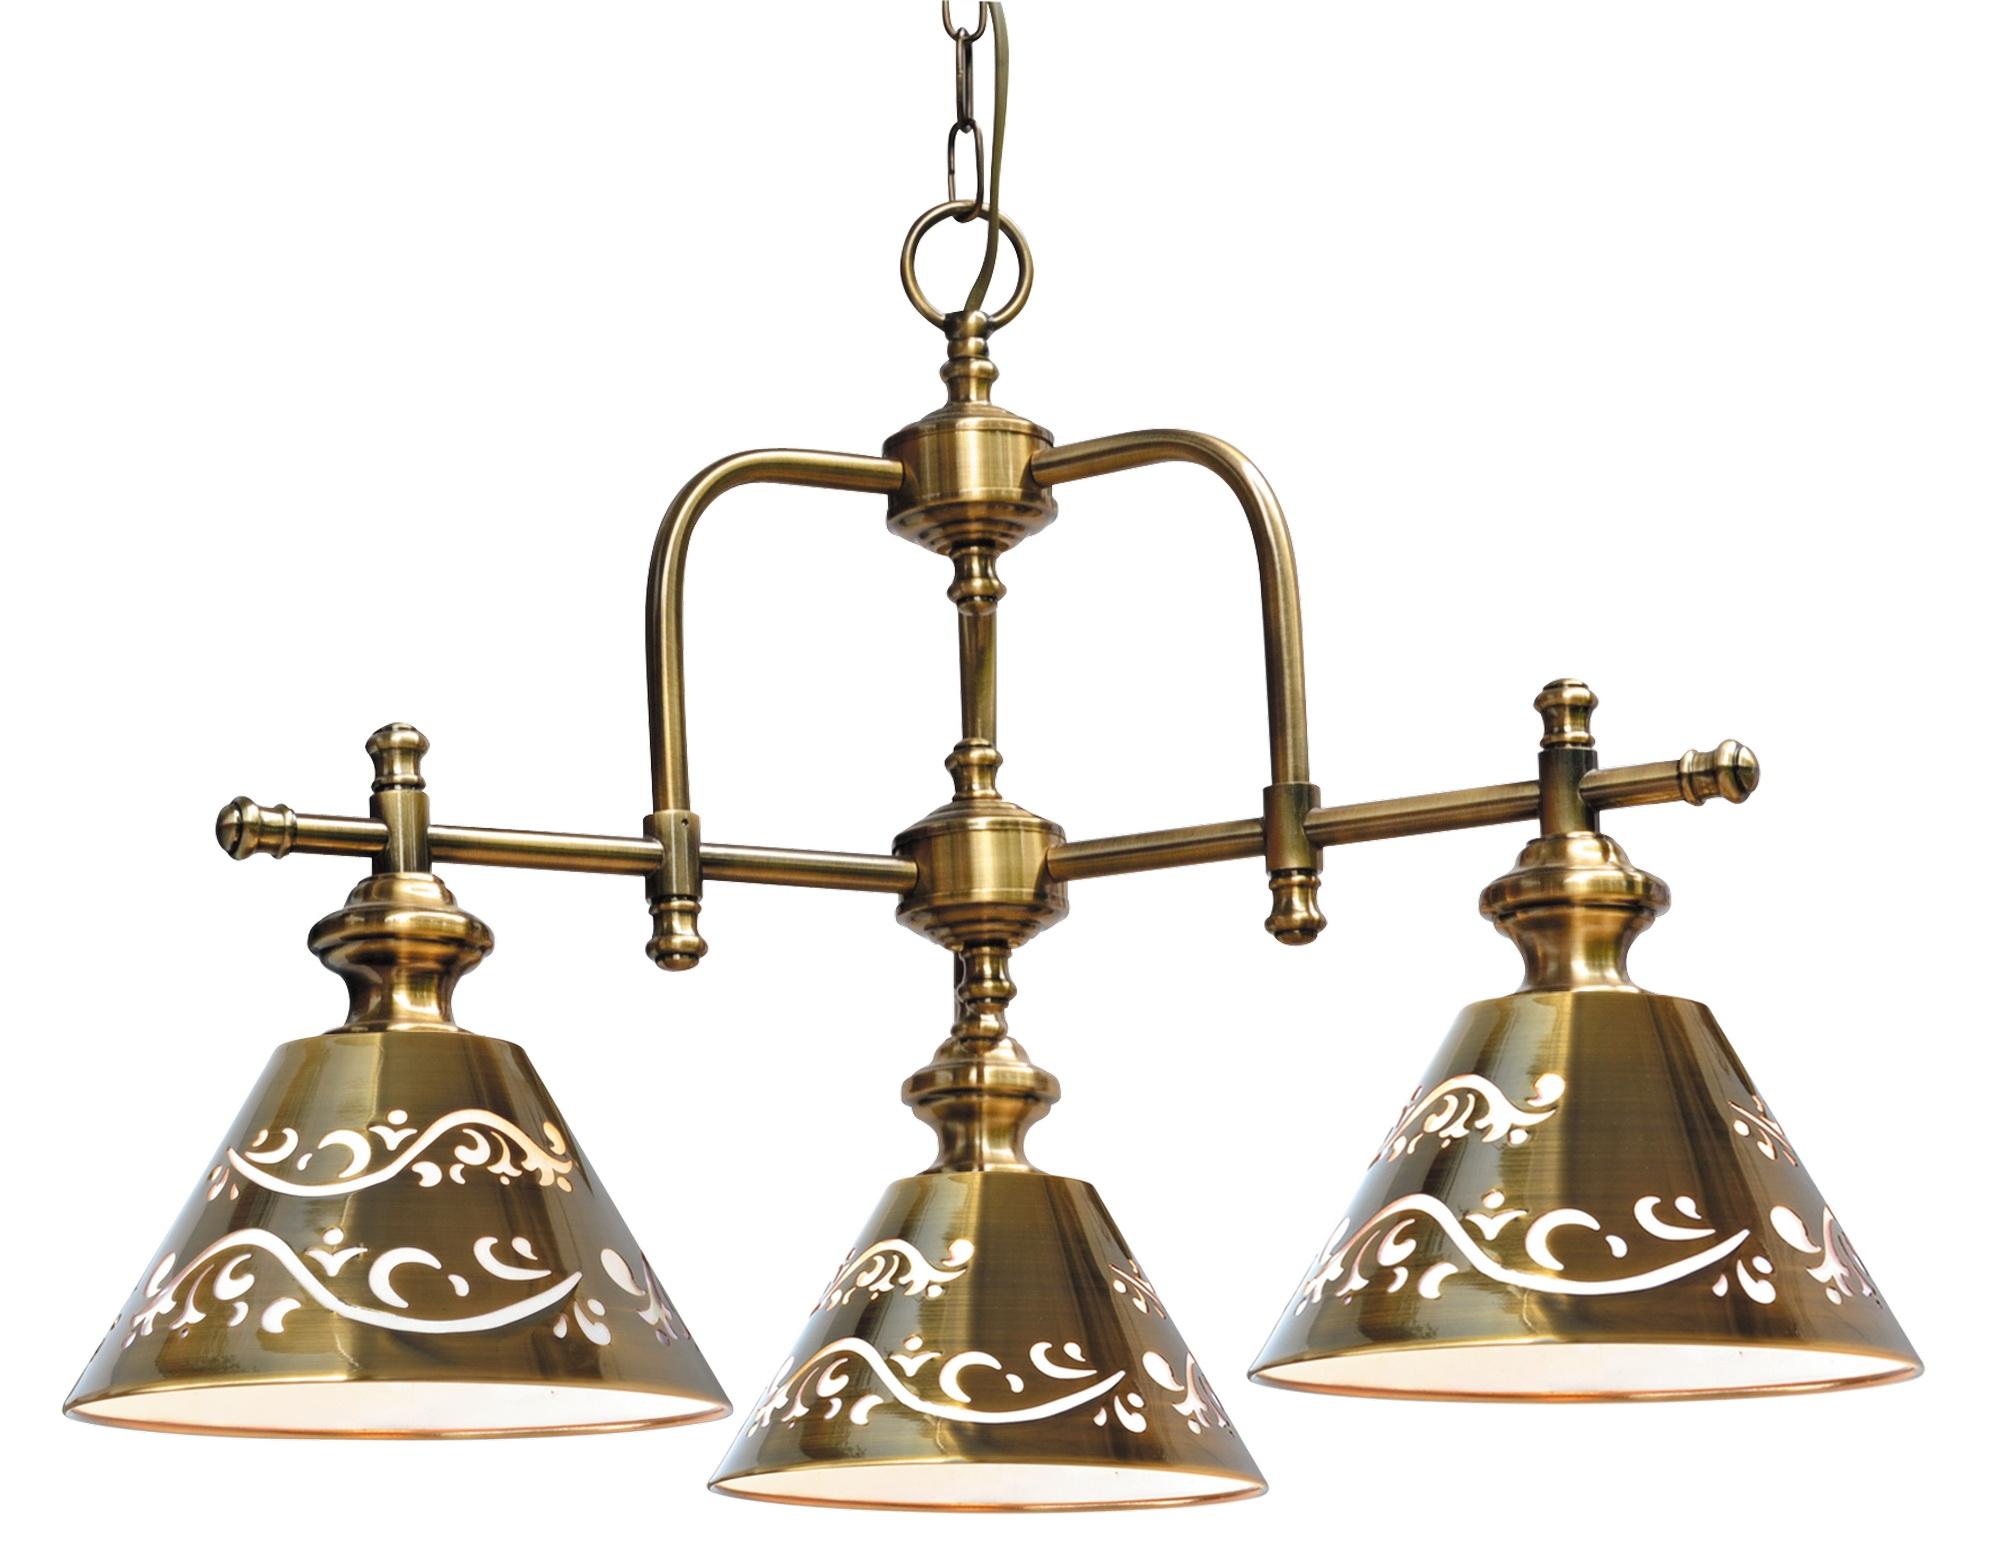 Люстра Arte lampЛюстры<br>Назначение светильника: для комнаты,<br>Стиль светильника: классика,<br>Тип: подвесная,<br>Материал светильника: металл,<br>Материал арматуры: металл,<br>Длина (мм): 650,<br>Ширина: 650,<br>Высота: 410,<br>Количество ламп: 3,<br>Тип лампы: накаливания,<br>Мощность: 40,<br>Патрон: Е14,<br>Цвет арматуры: бронза<br>